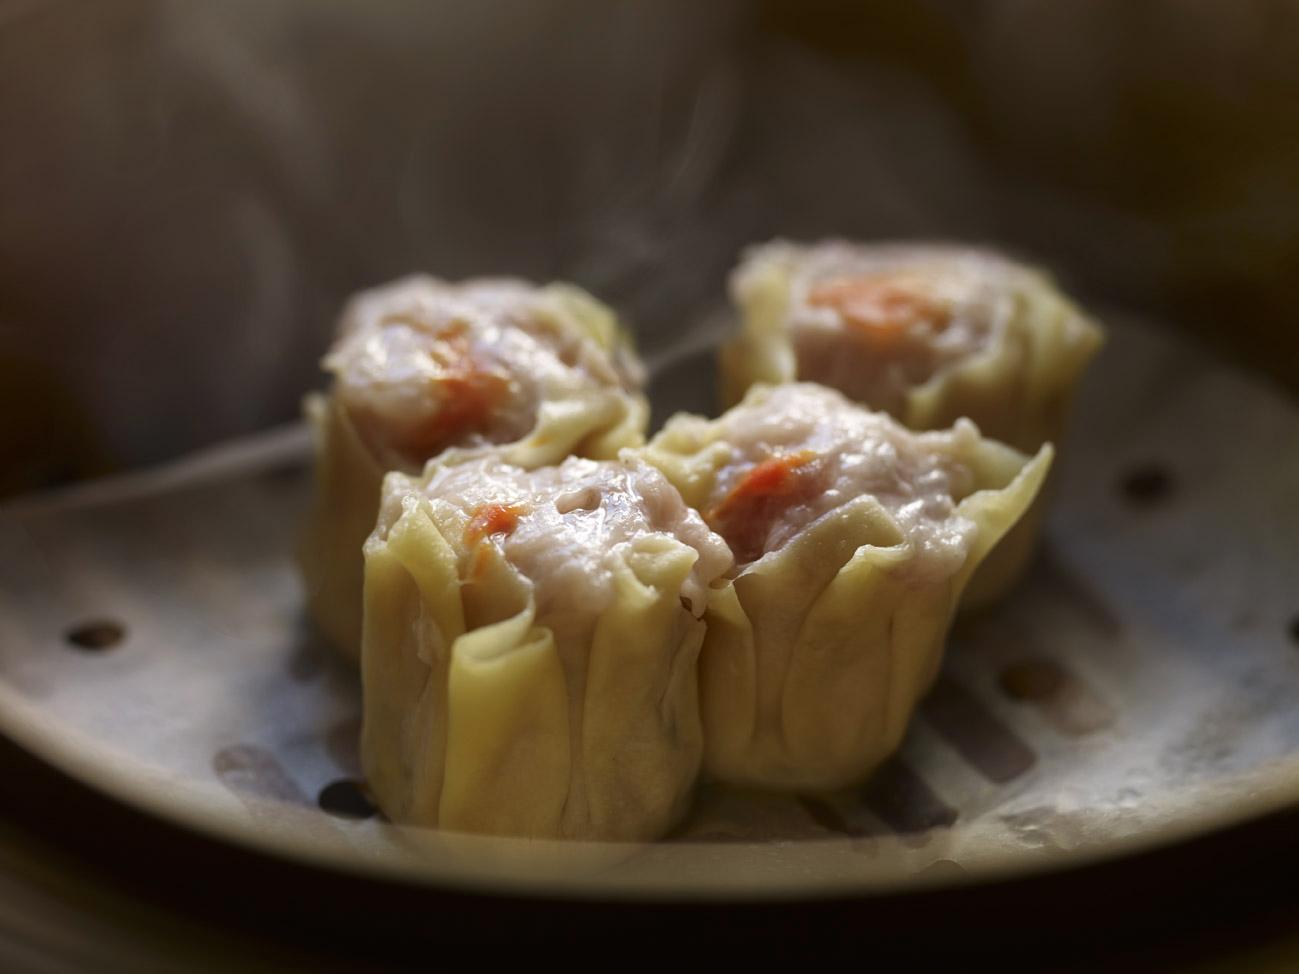 Cantonese pork and prawn siu mai dim sum in steamer